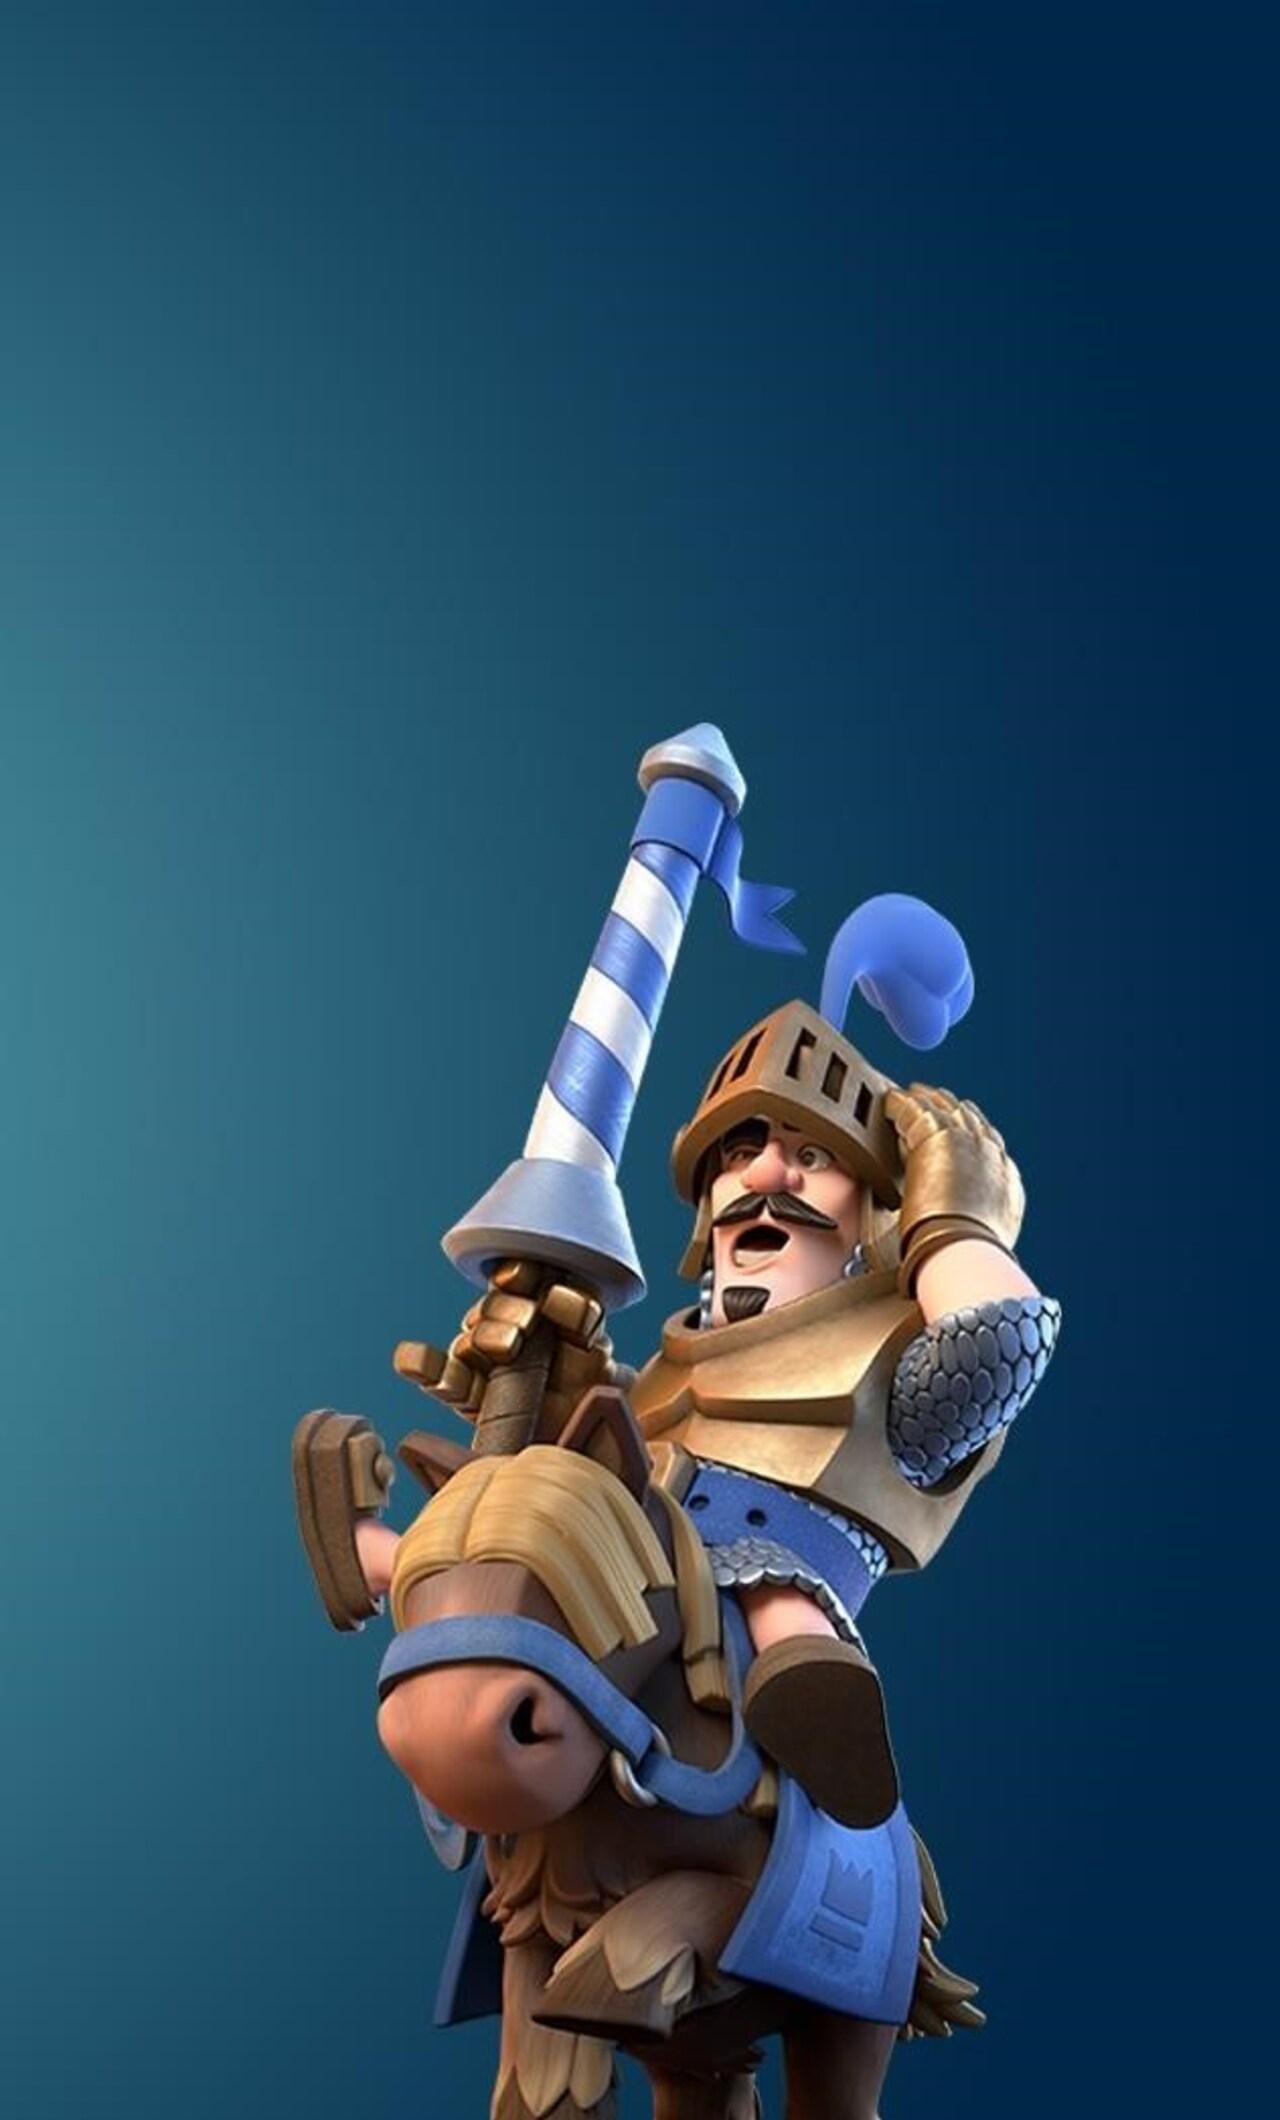 clash-royale-supercell-game-4k.jpg